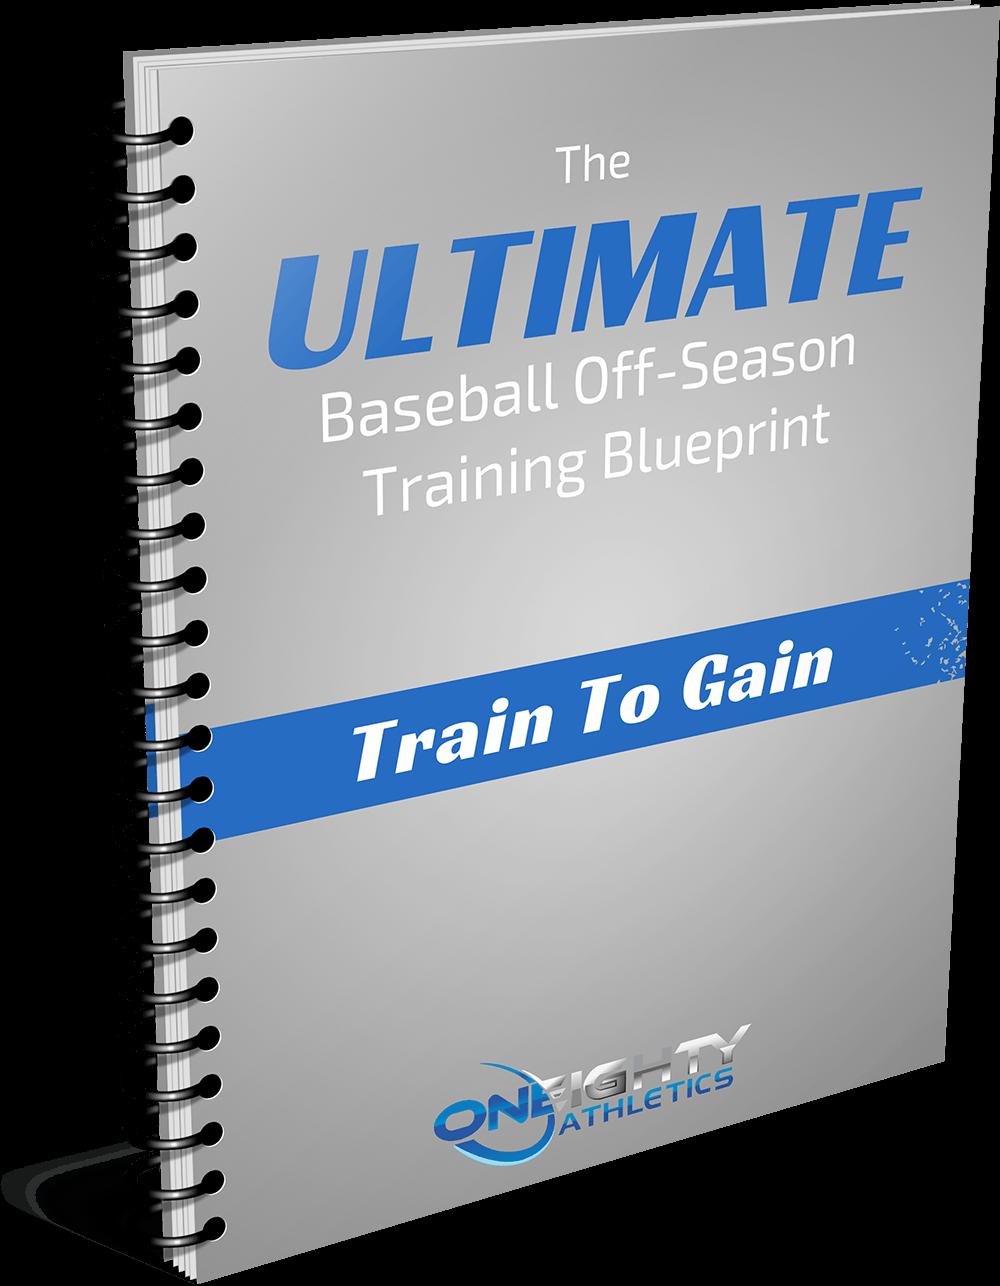 The ultimate baseball off season training blueprint malvernweather Image collections